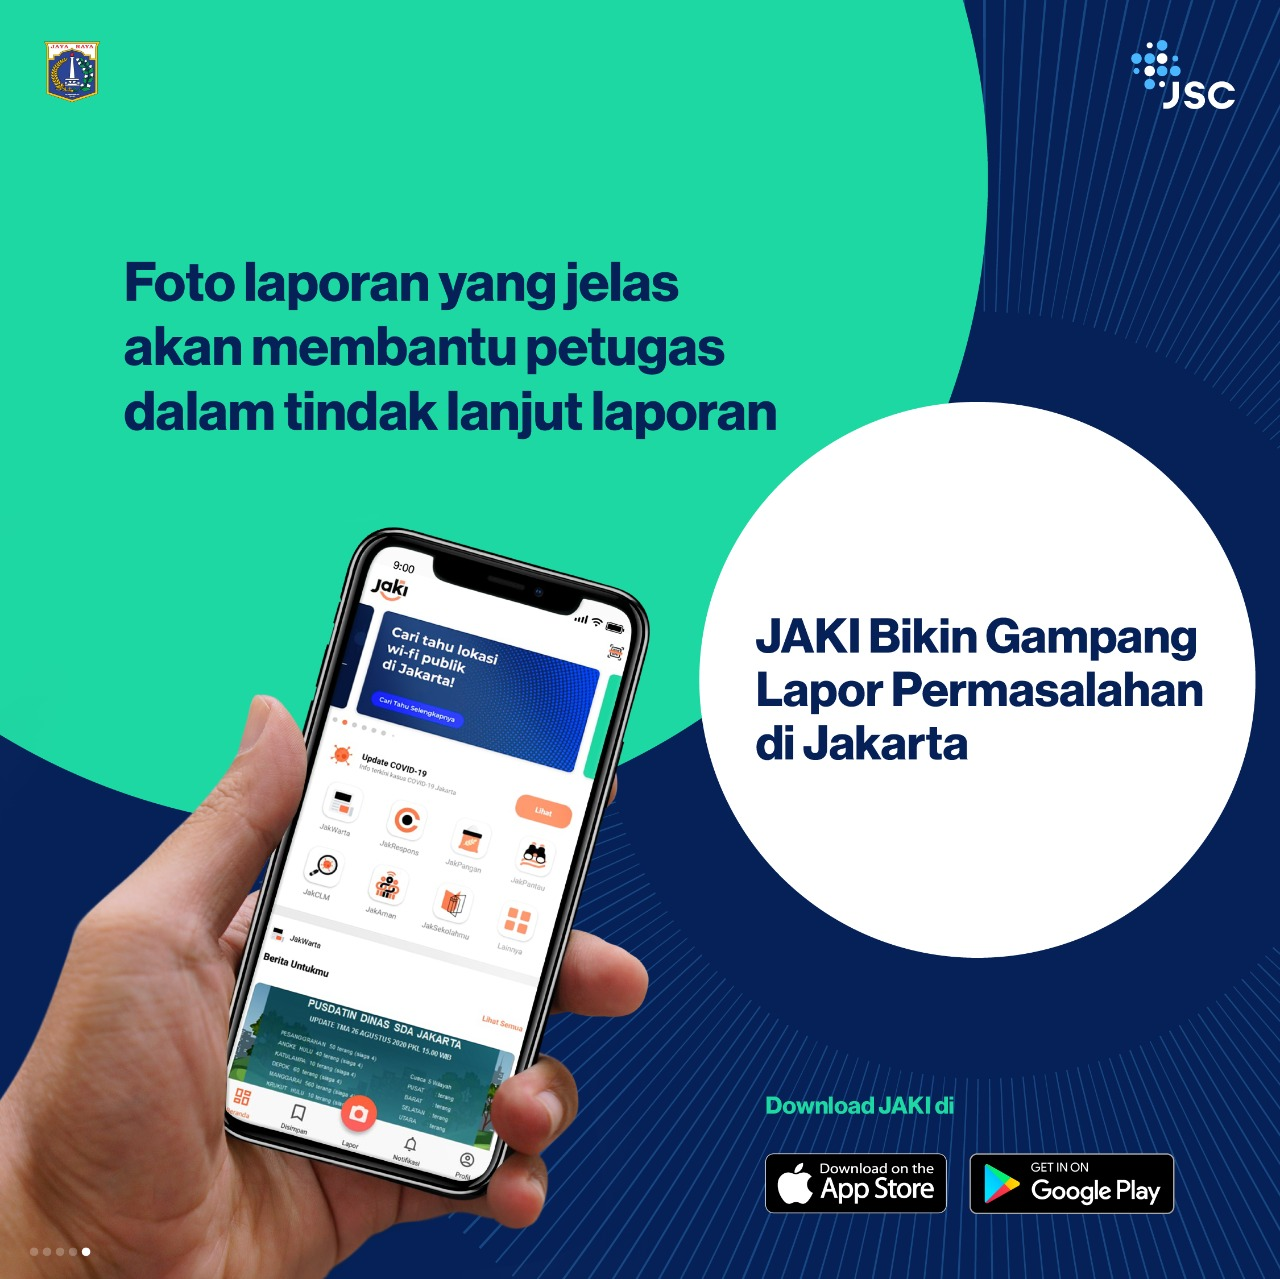 JAKI, JakLapor, PSBB, Jakarta, CRM